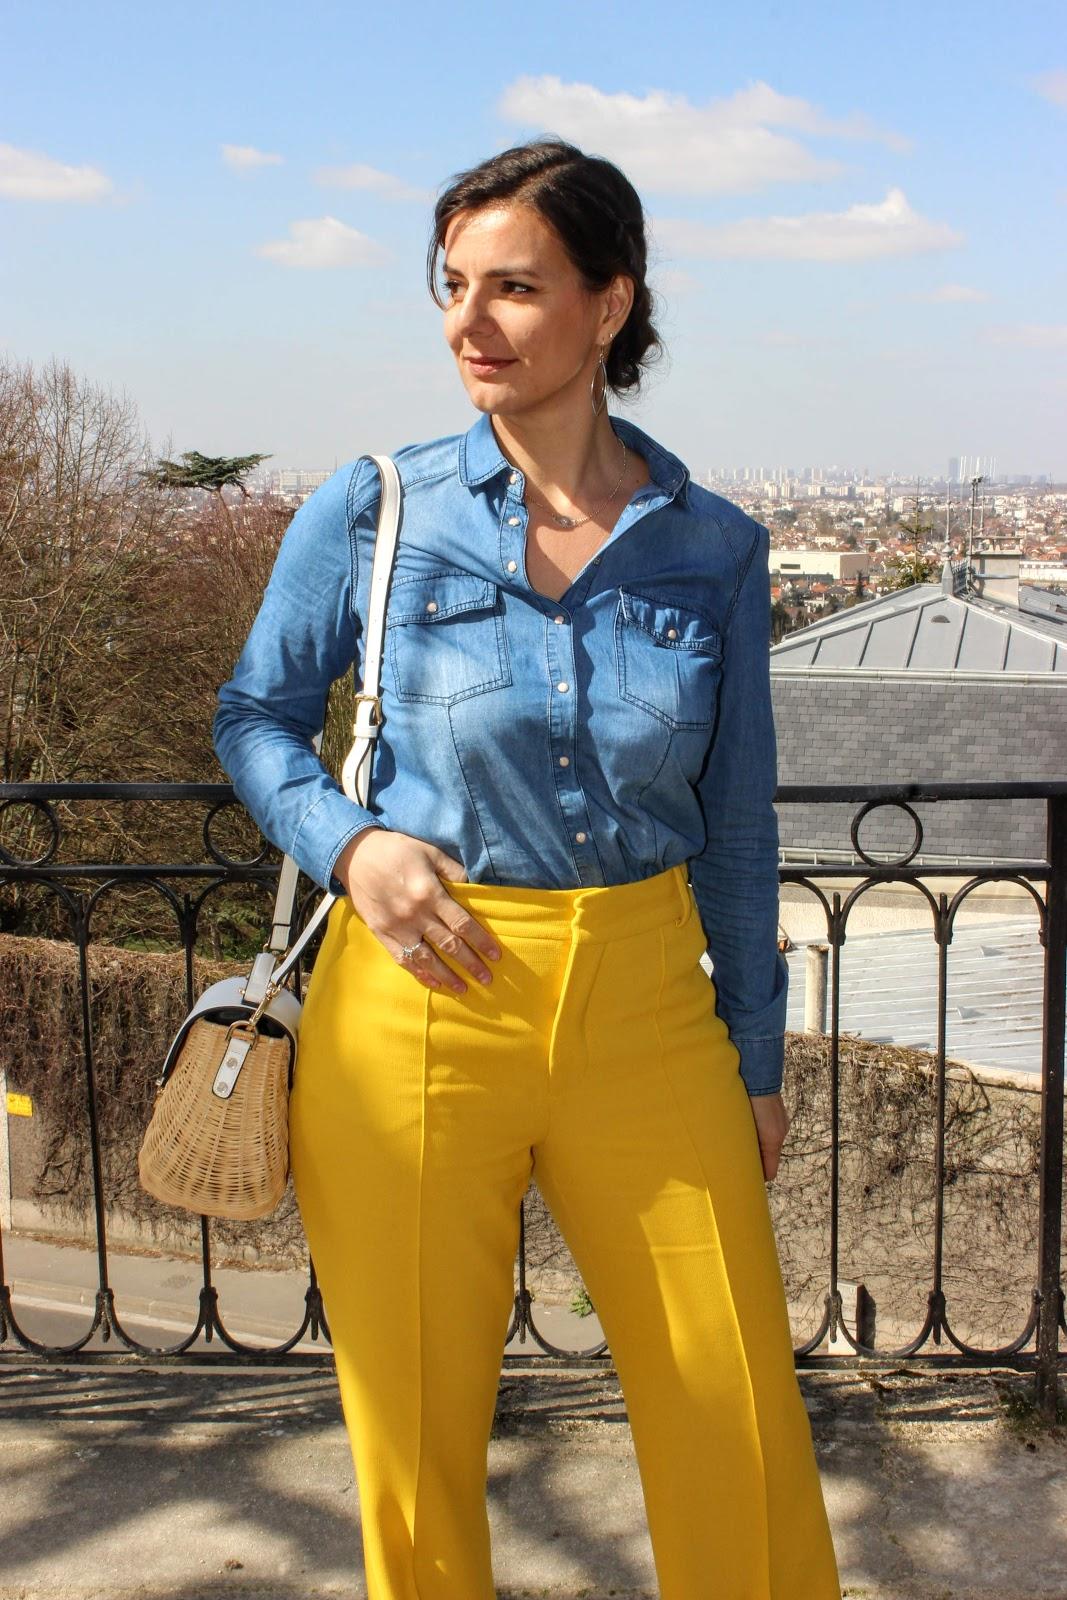 pantalon jaune zara, panier dune london, look du jour, les petites bulles de ma vie, mode